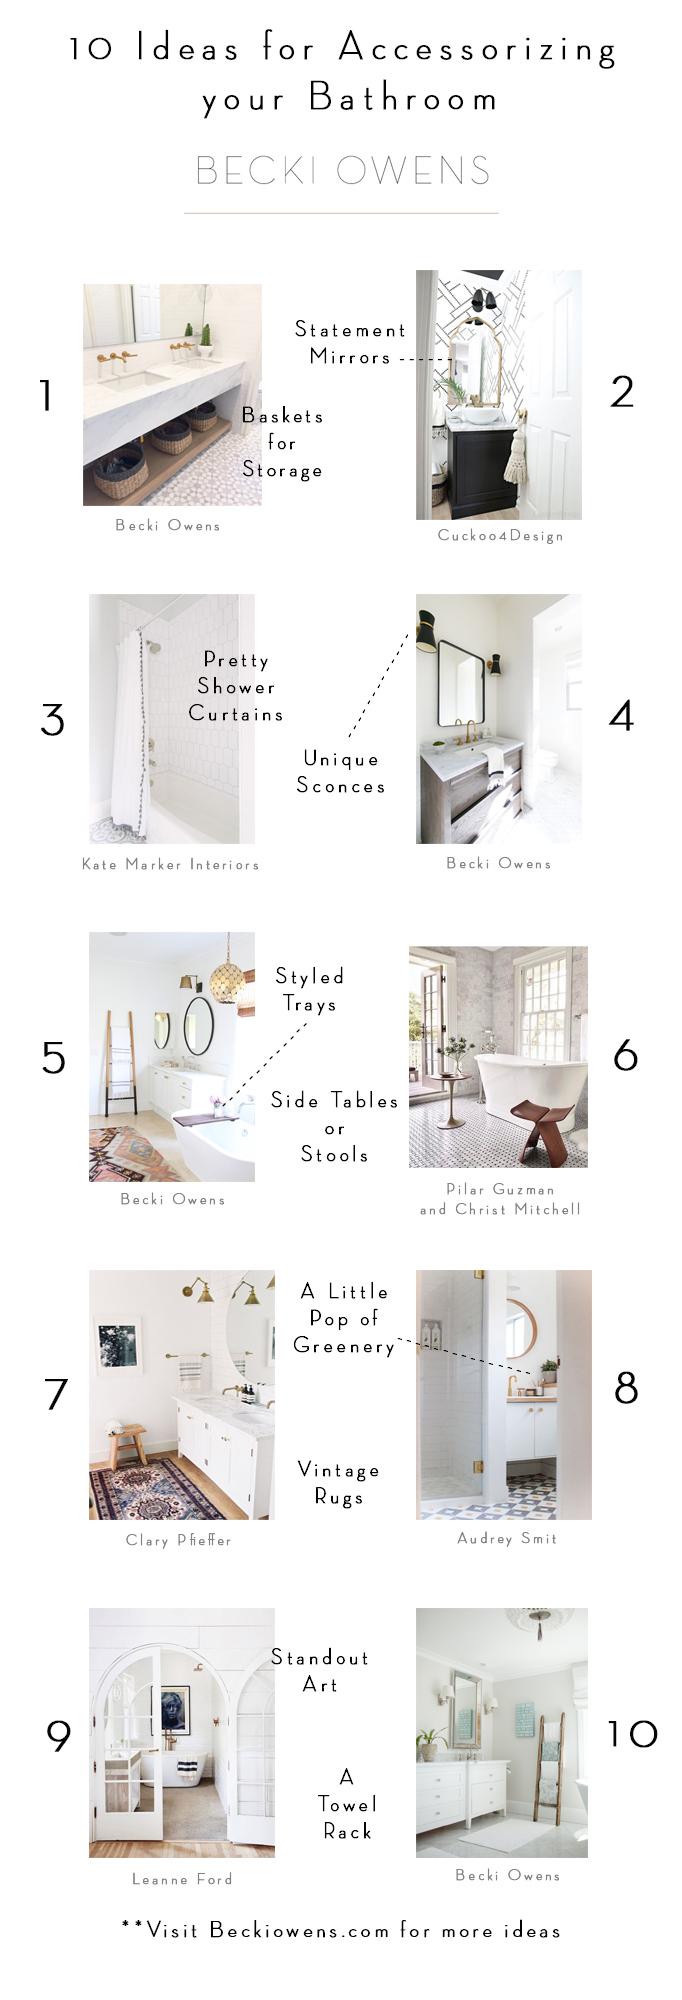 10 ideas for accessorizing your bathroom